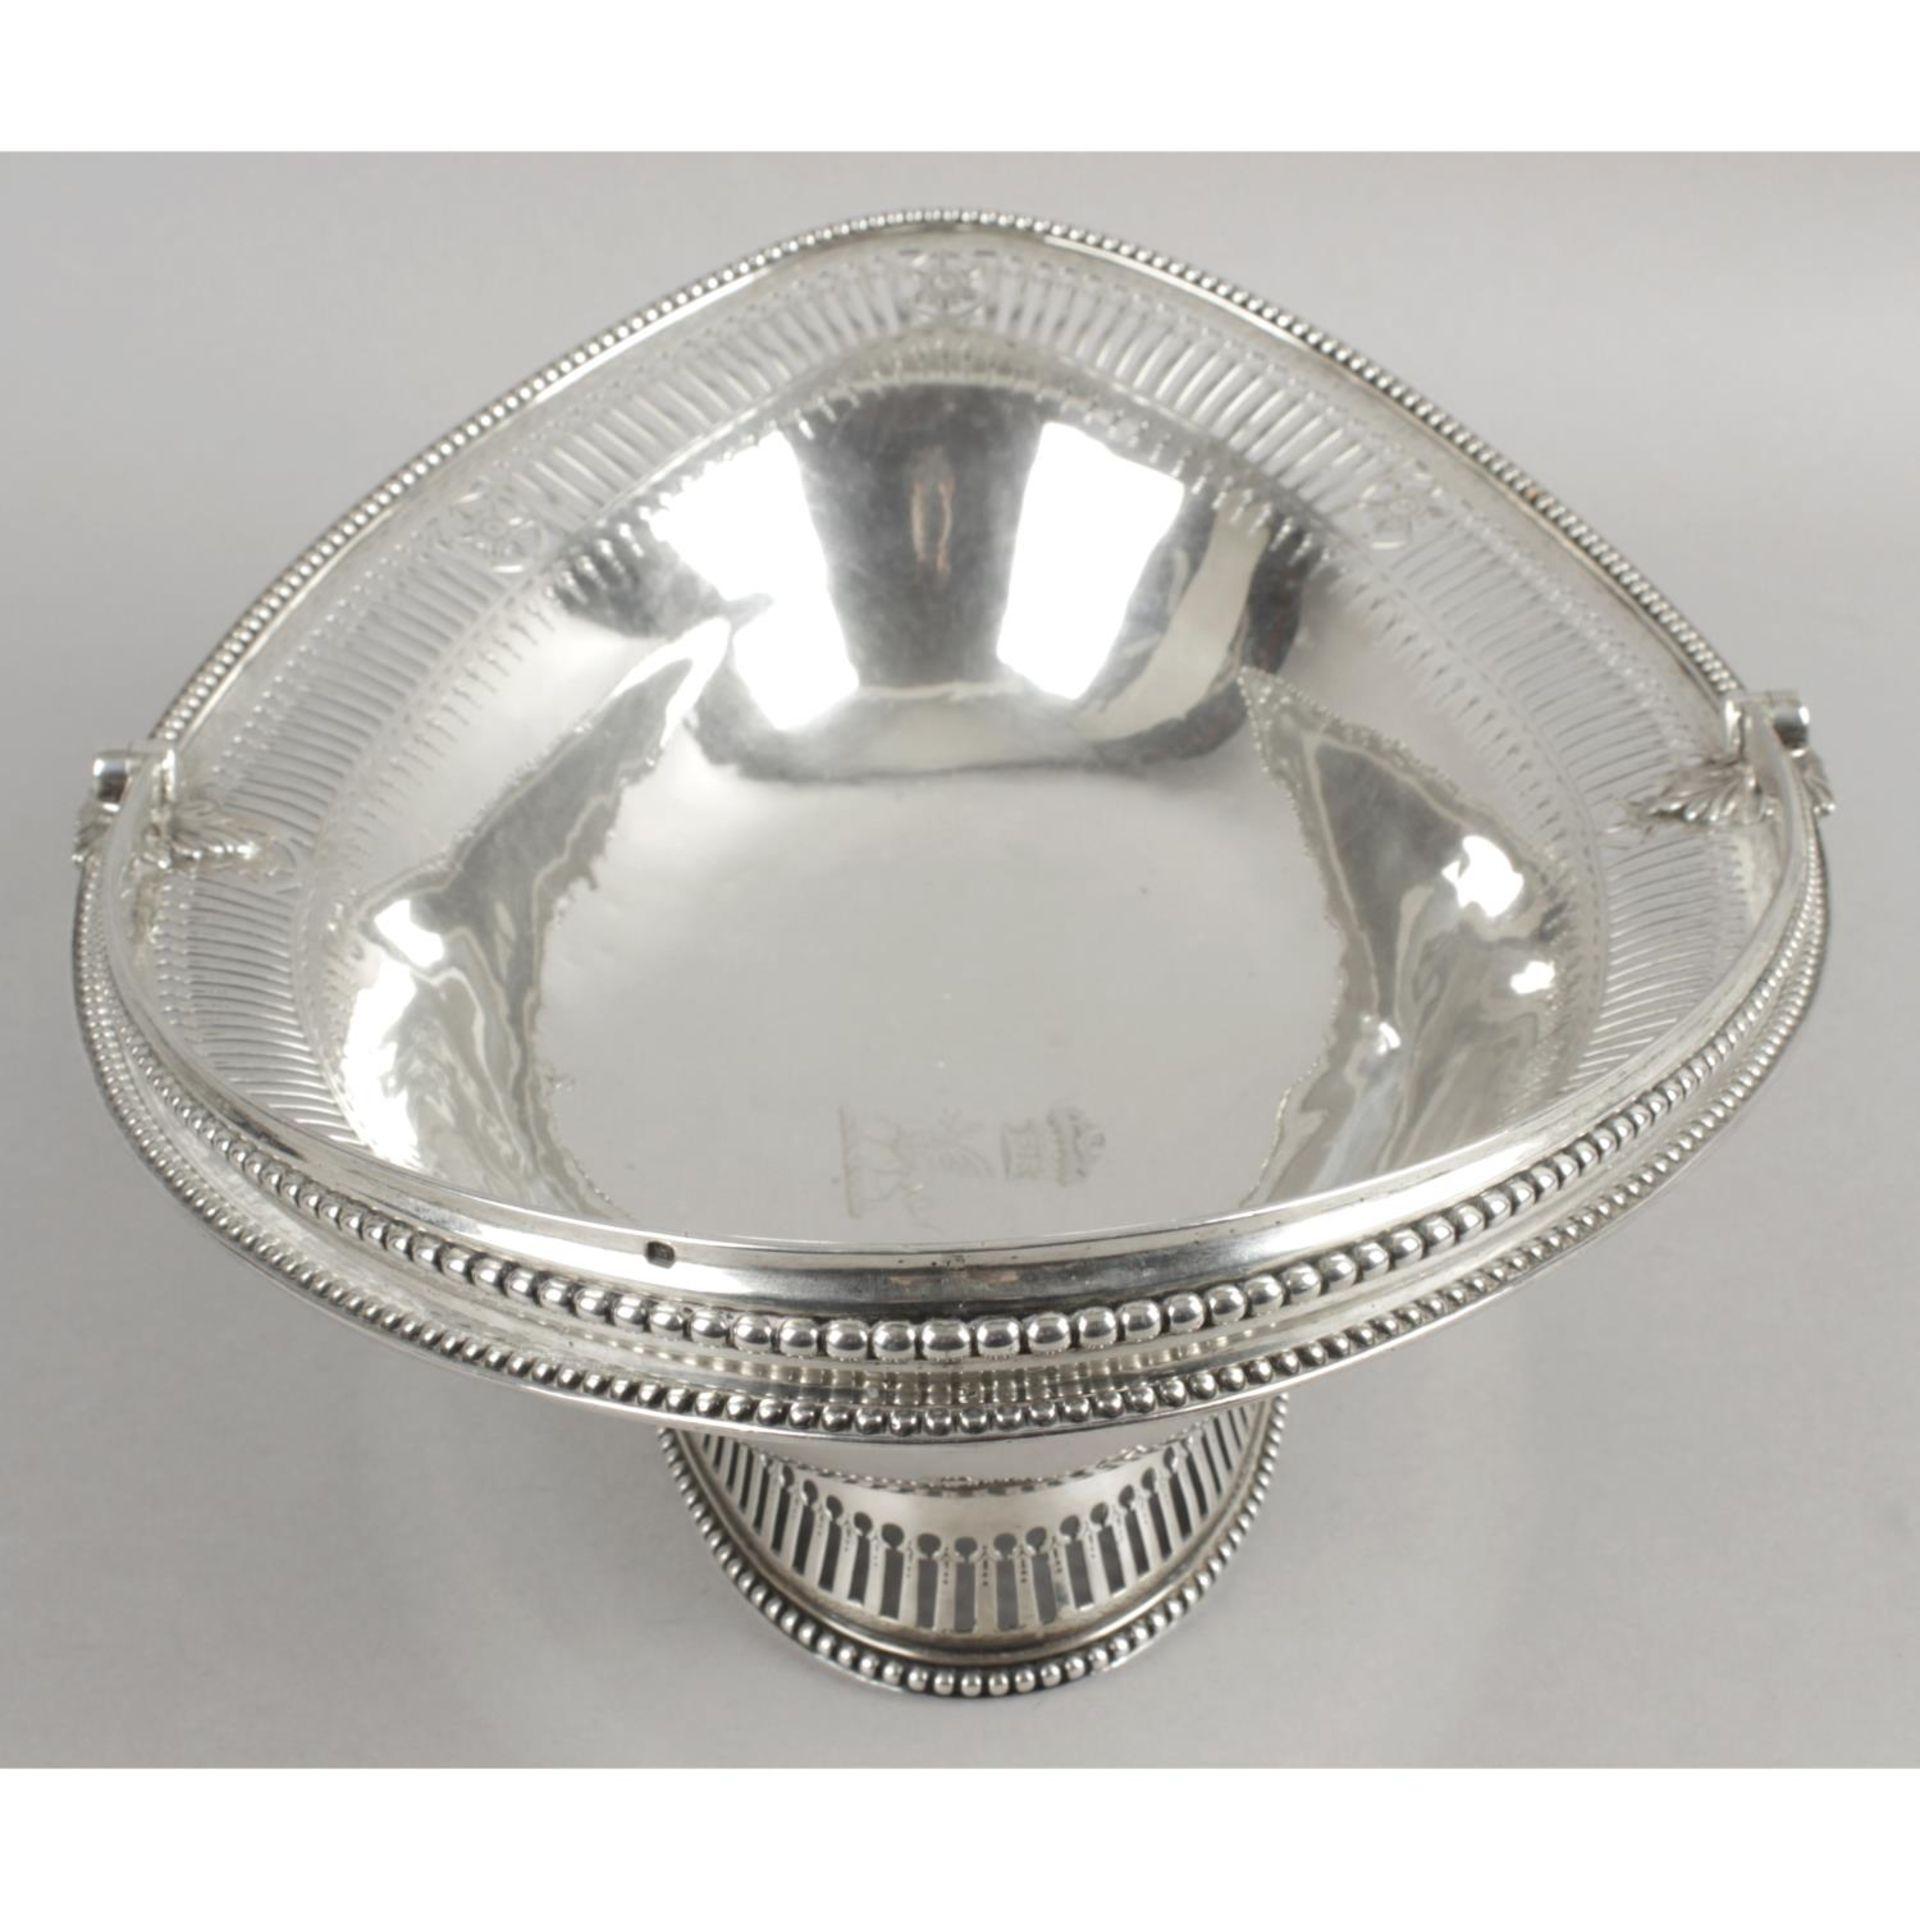 A George III silver swing-handled cake basket, - Image 4 of 6